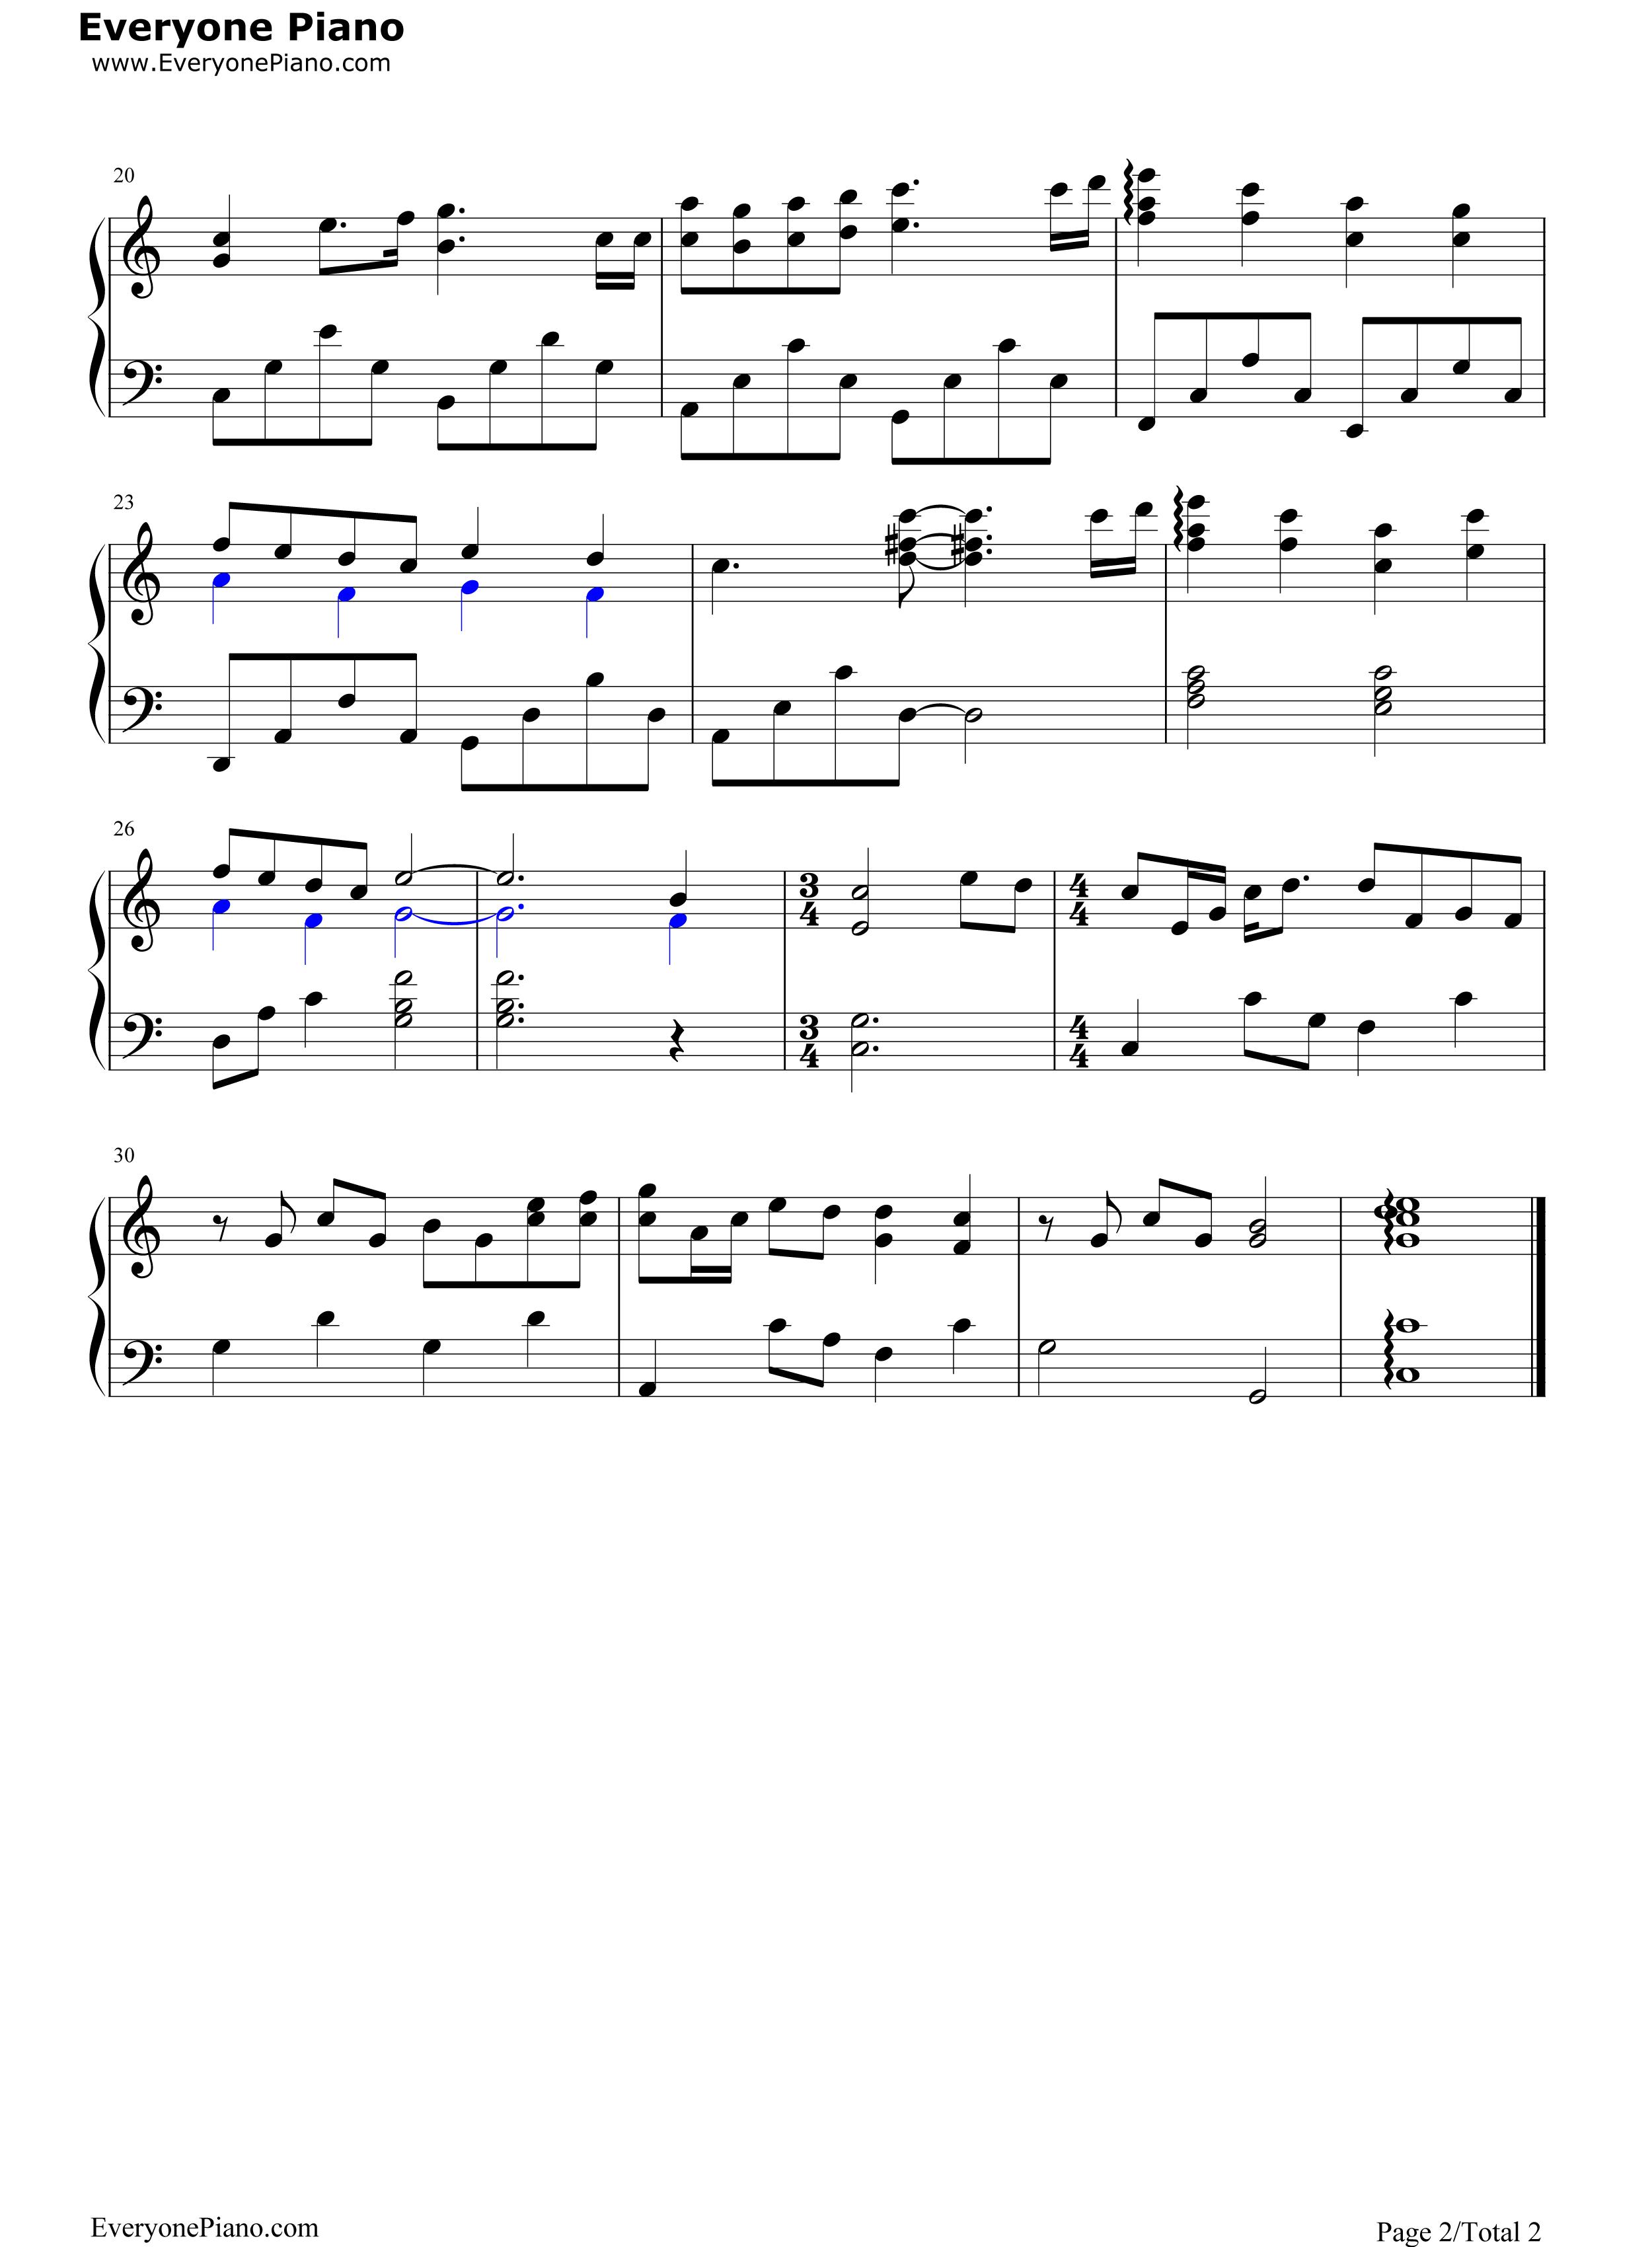 Tender love yang yang stave preview 2 free piano sheet music listen now print sheet tender love yang yang stave preview 2 hexwebz Images